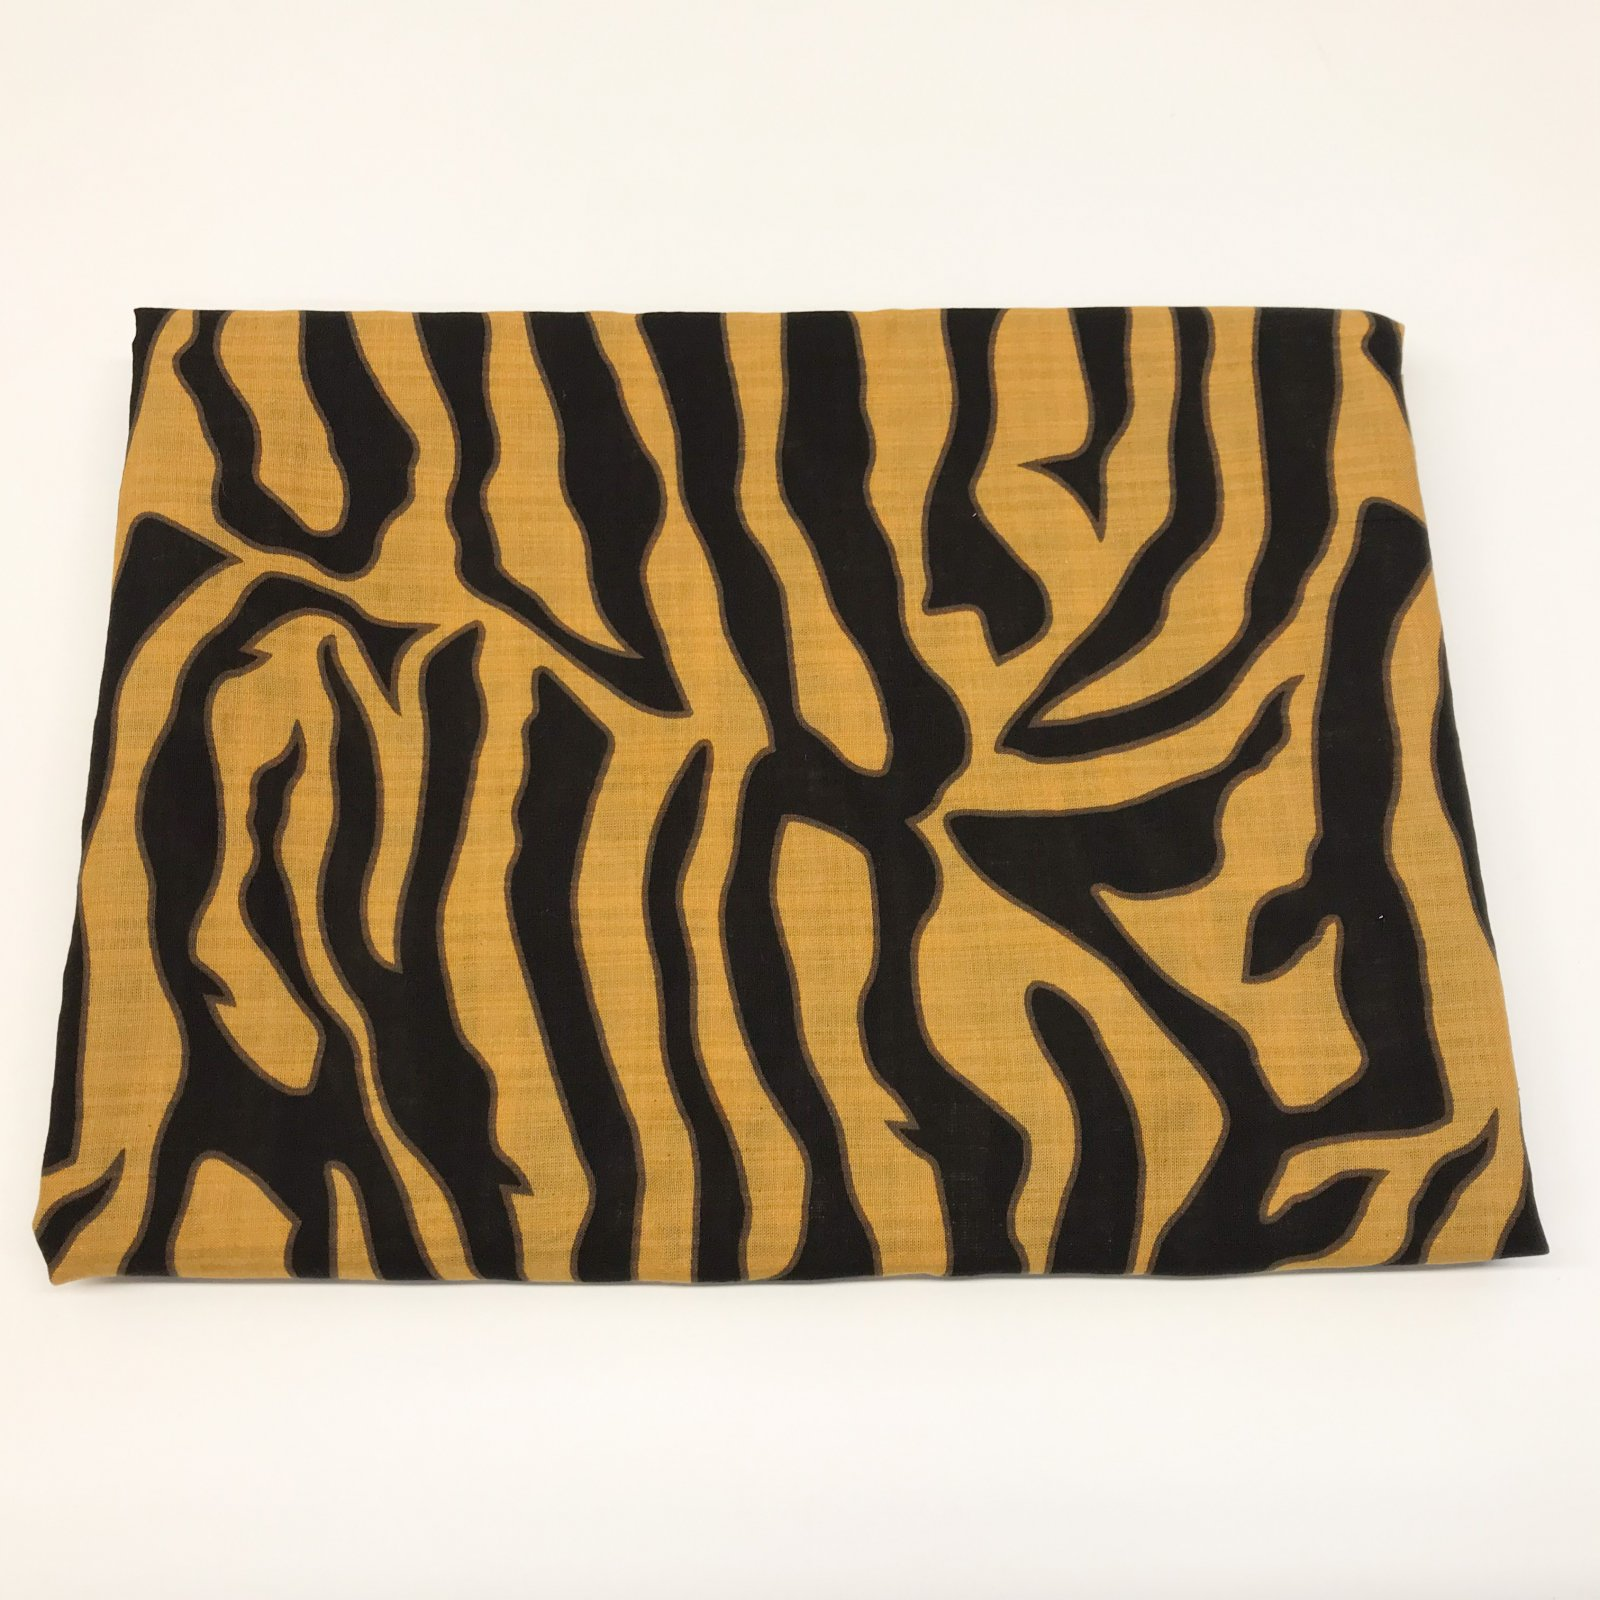 1 yard + 14 inches - Mustard & Black Abstract Zebra